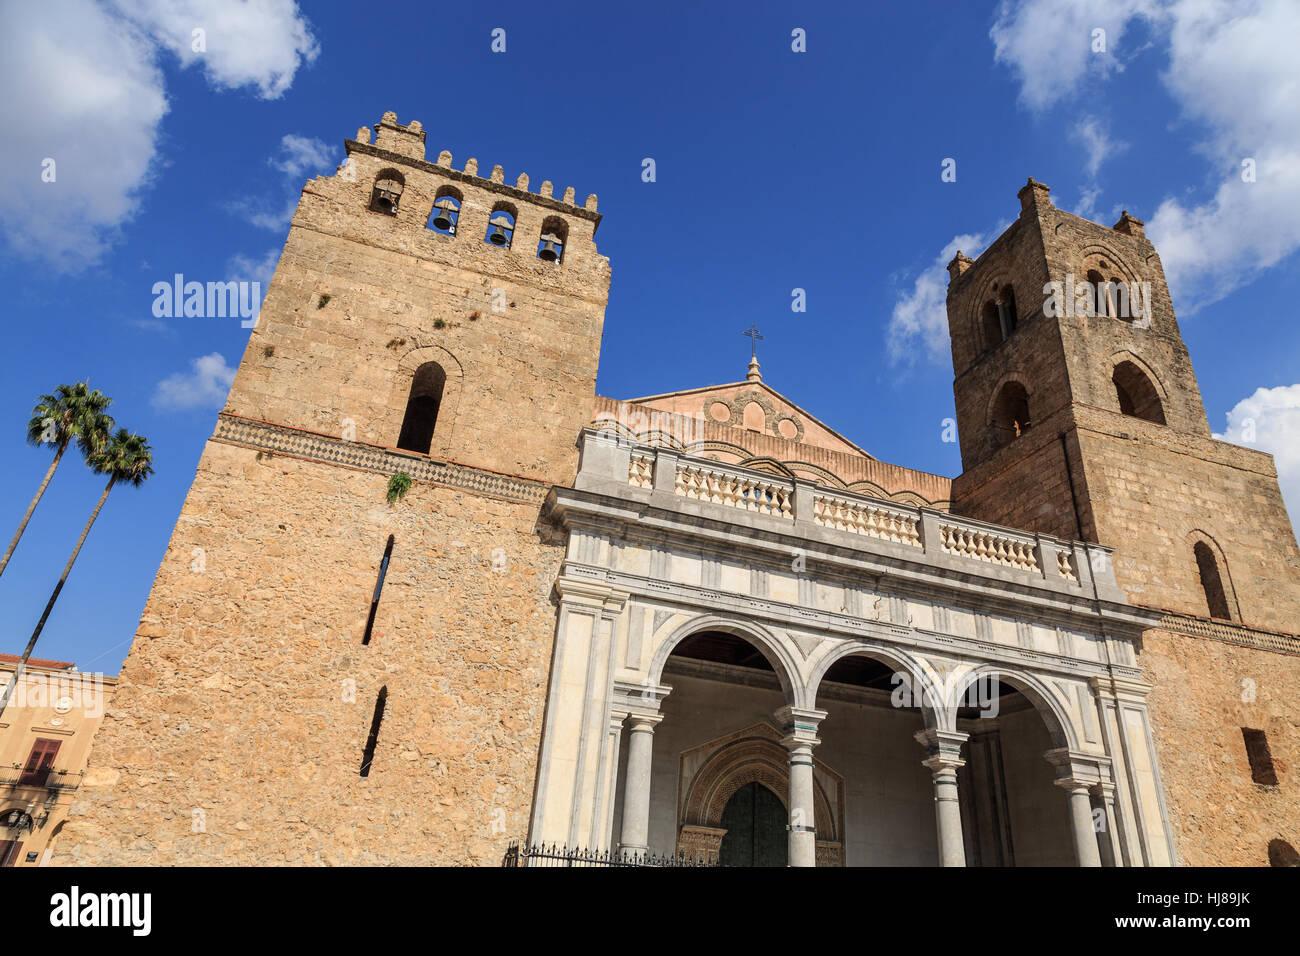 Duomo of Monreale, Sicily - Stock Image